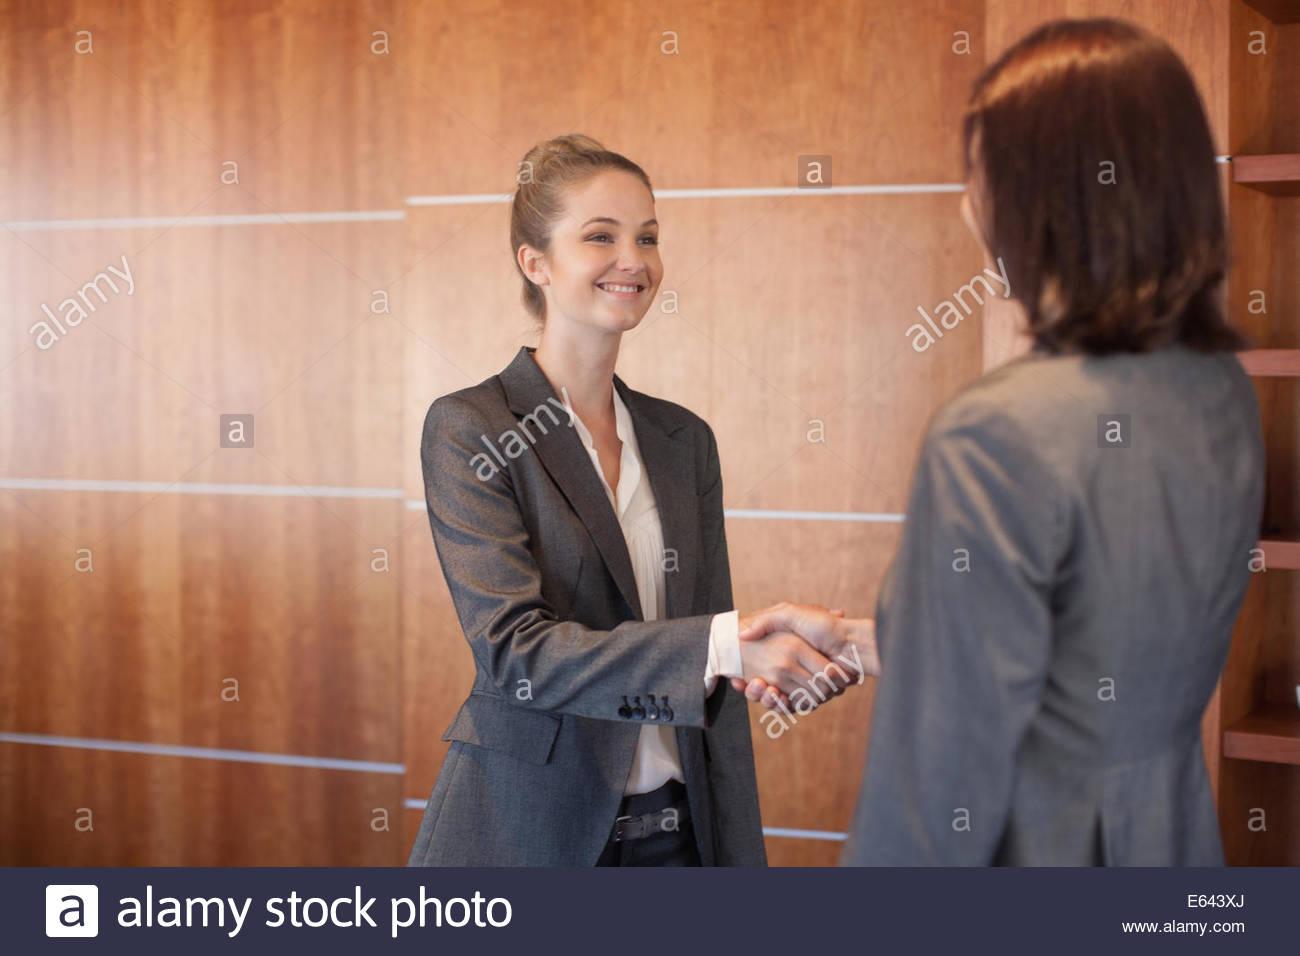 Two businesswomen shaking hands - Stock Image